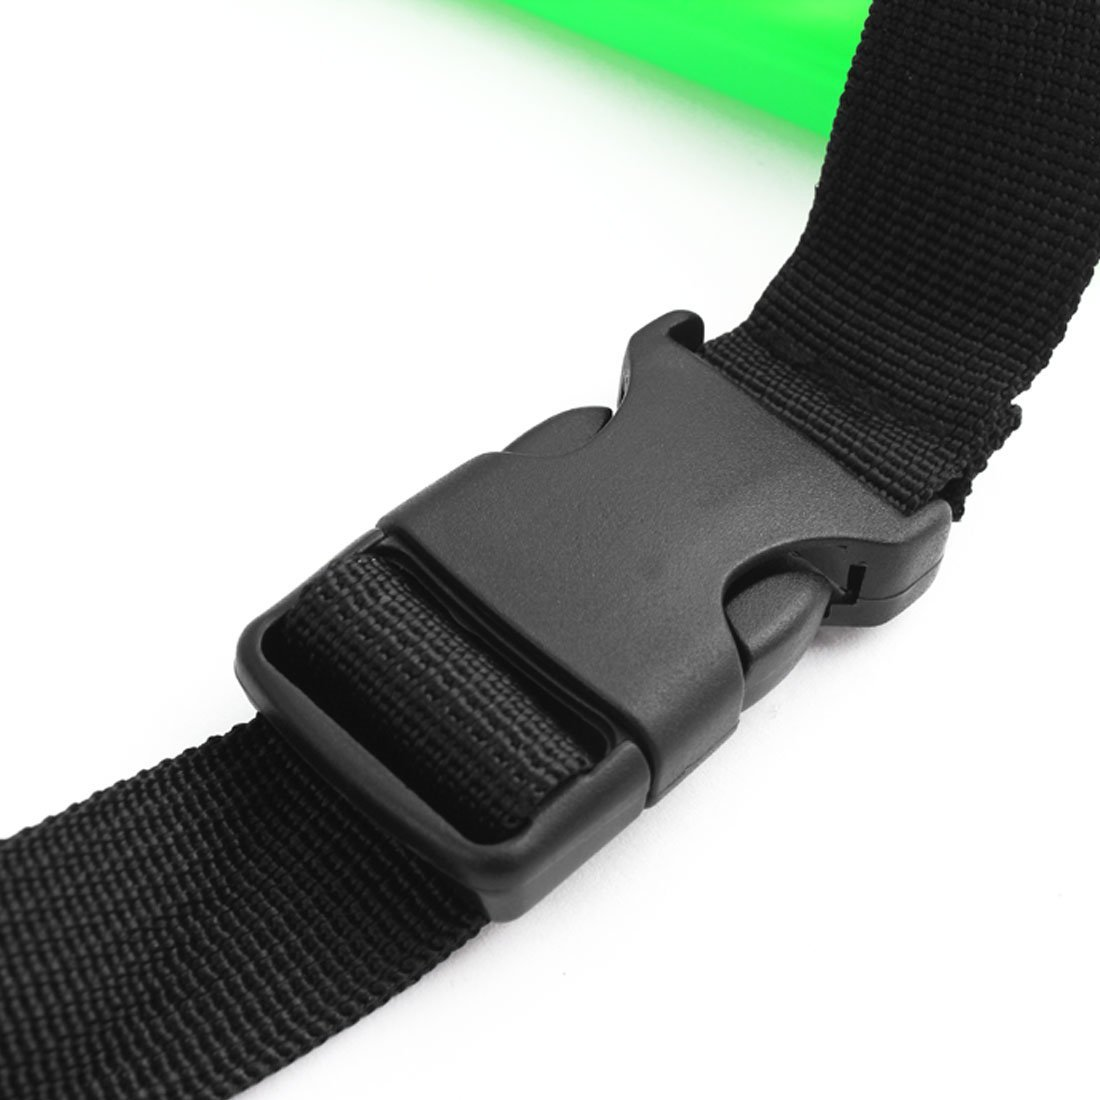 Amazon.com : eDealMax portátil Natación Kit resistente al agua Bolsa del bolso del teléfono 15.3 x 21.8cm Claro : Sports & Outdoors